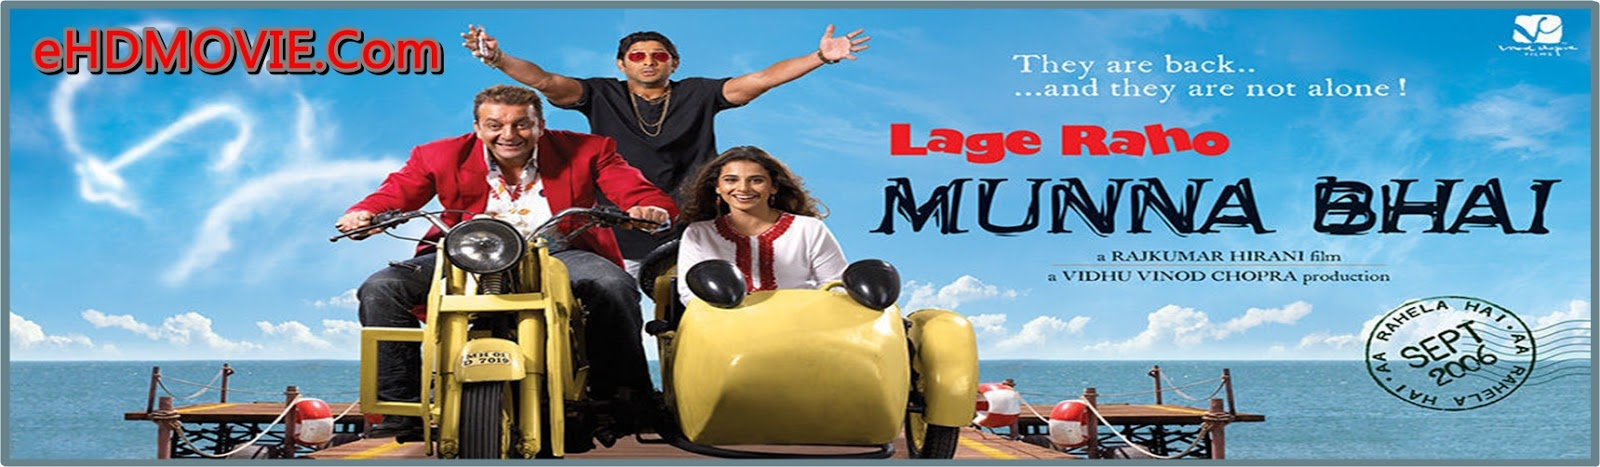 Lage Raho Munna Bhai 2006 Full Movie Hindi 720p - 480p ORG HDRip 550MB - 1.3 ESubs Free Download